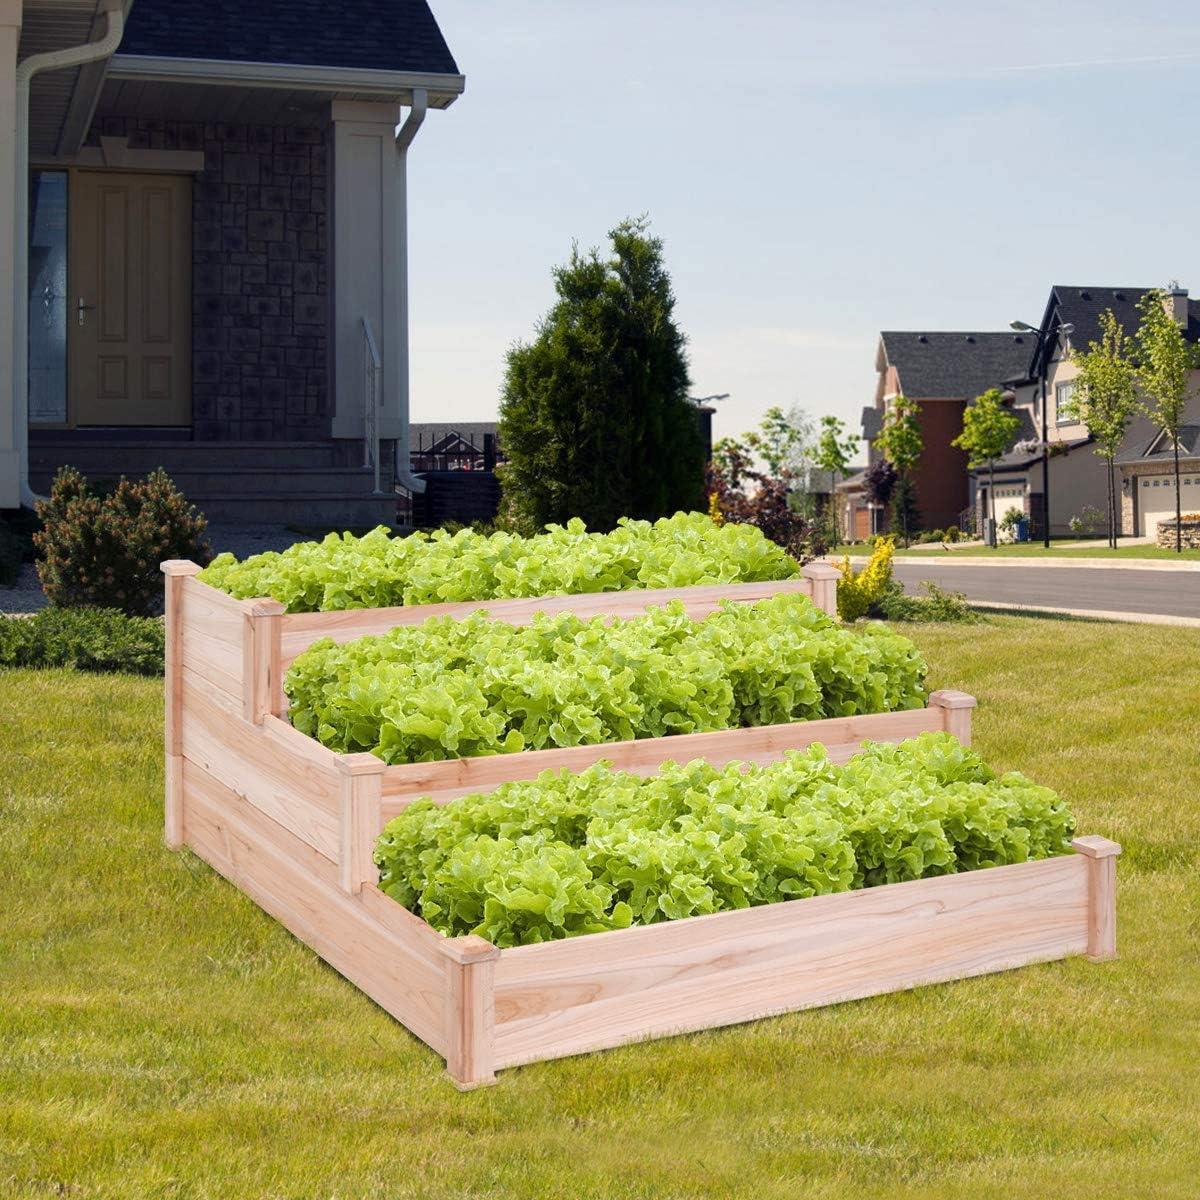 Giantex 3 Tier Wooden Elevated Raised Garden Bed Planter